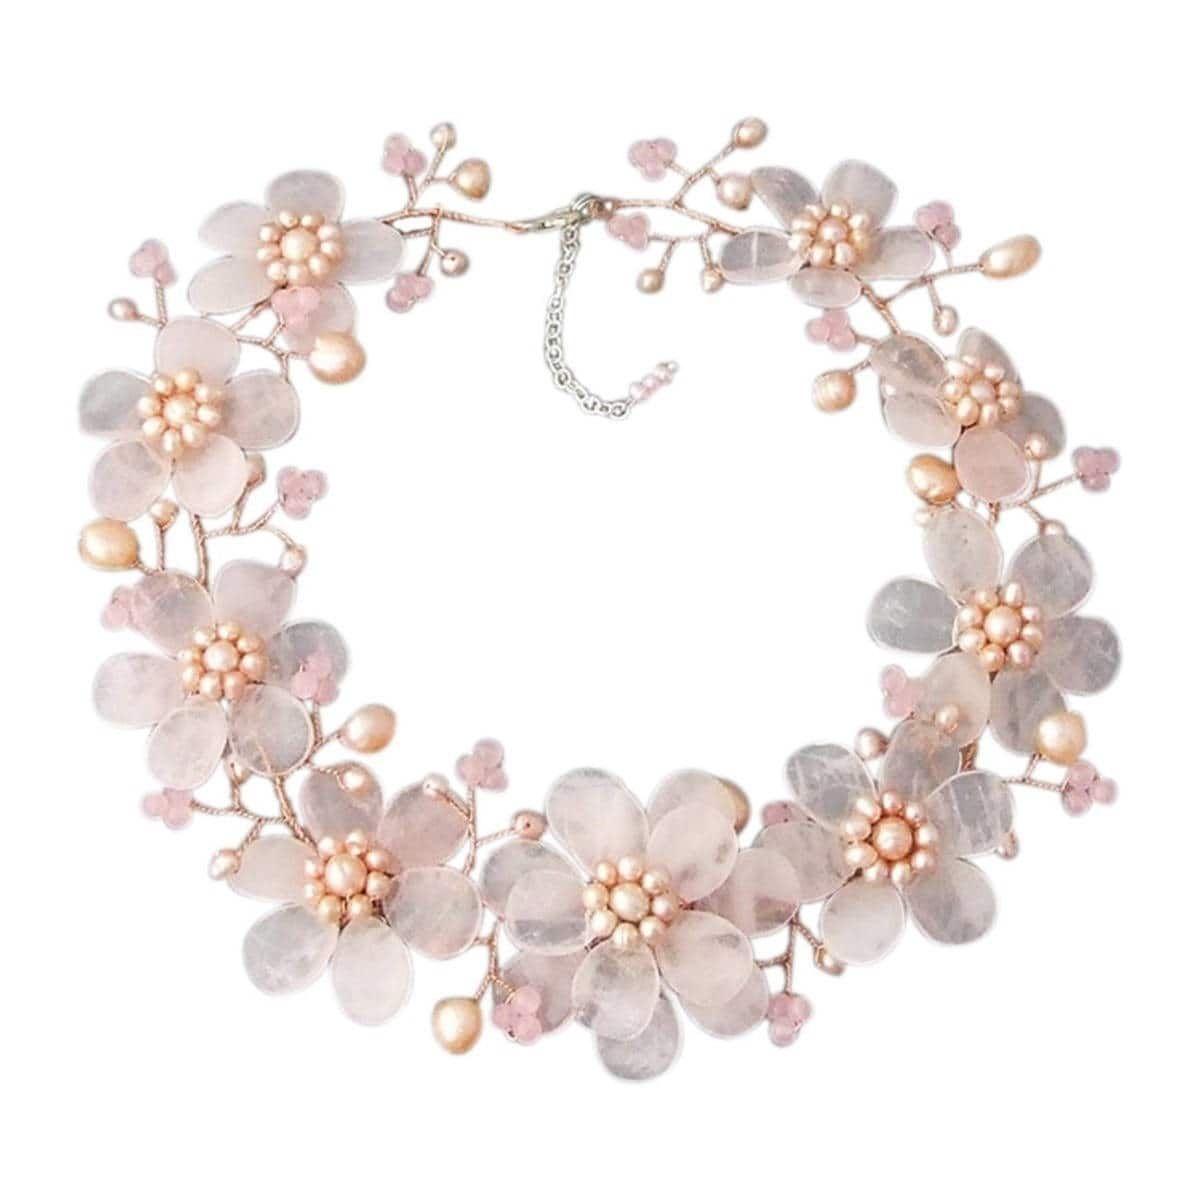 Floral Rose Quartz Freshwater Pearl Necklace